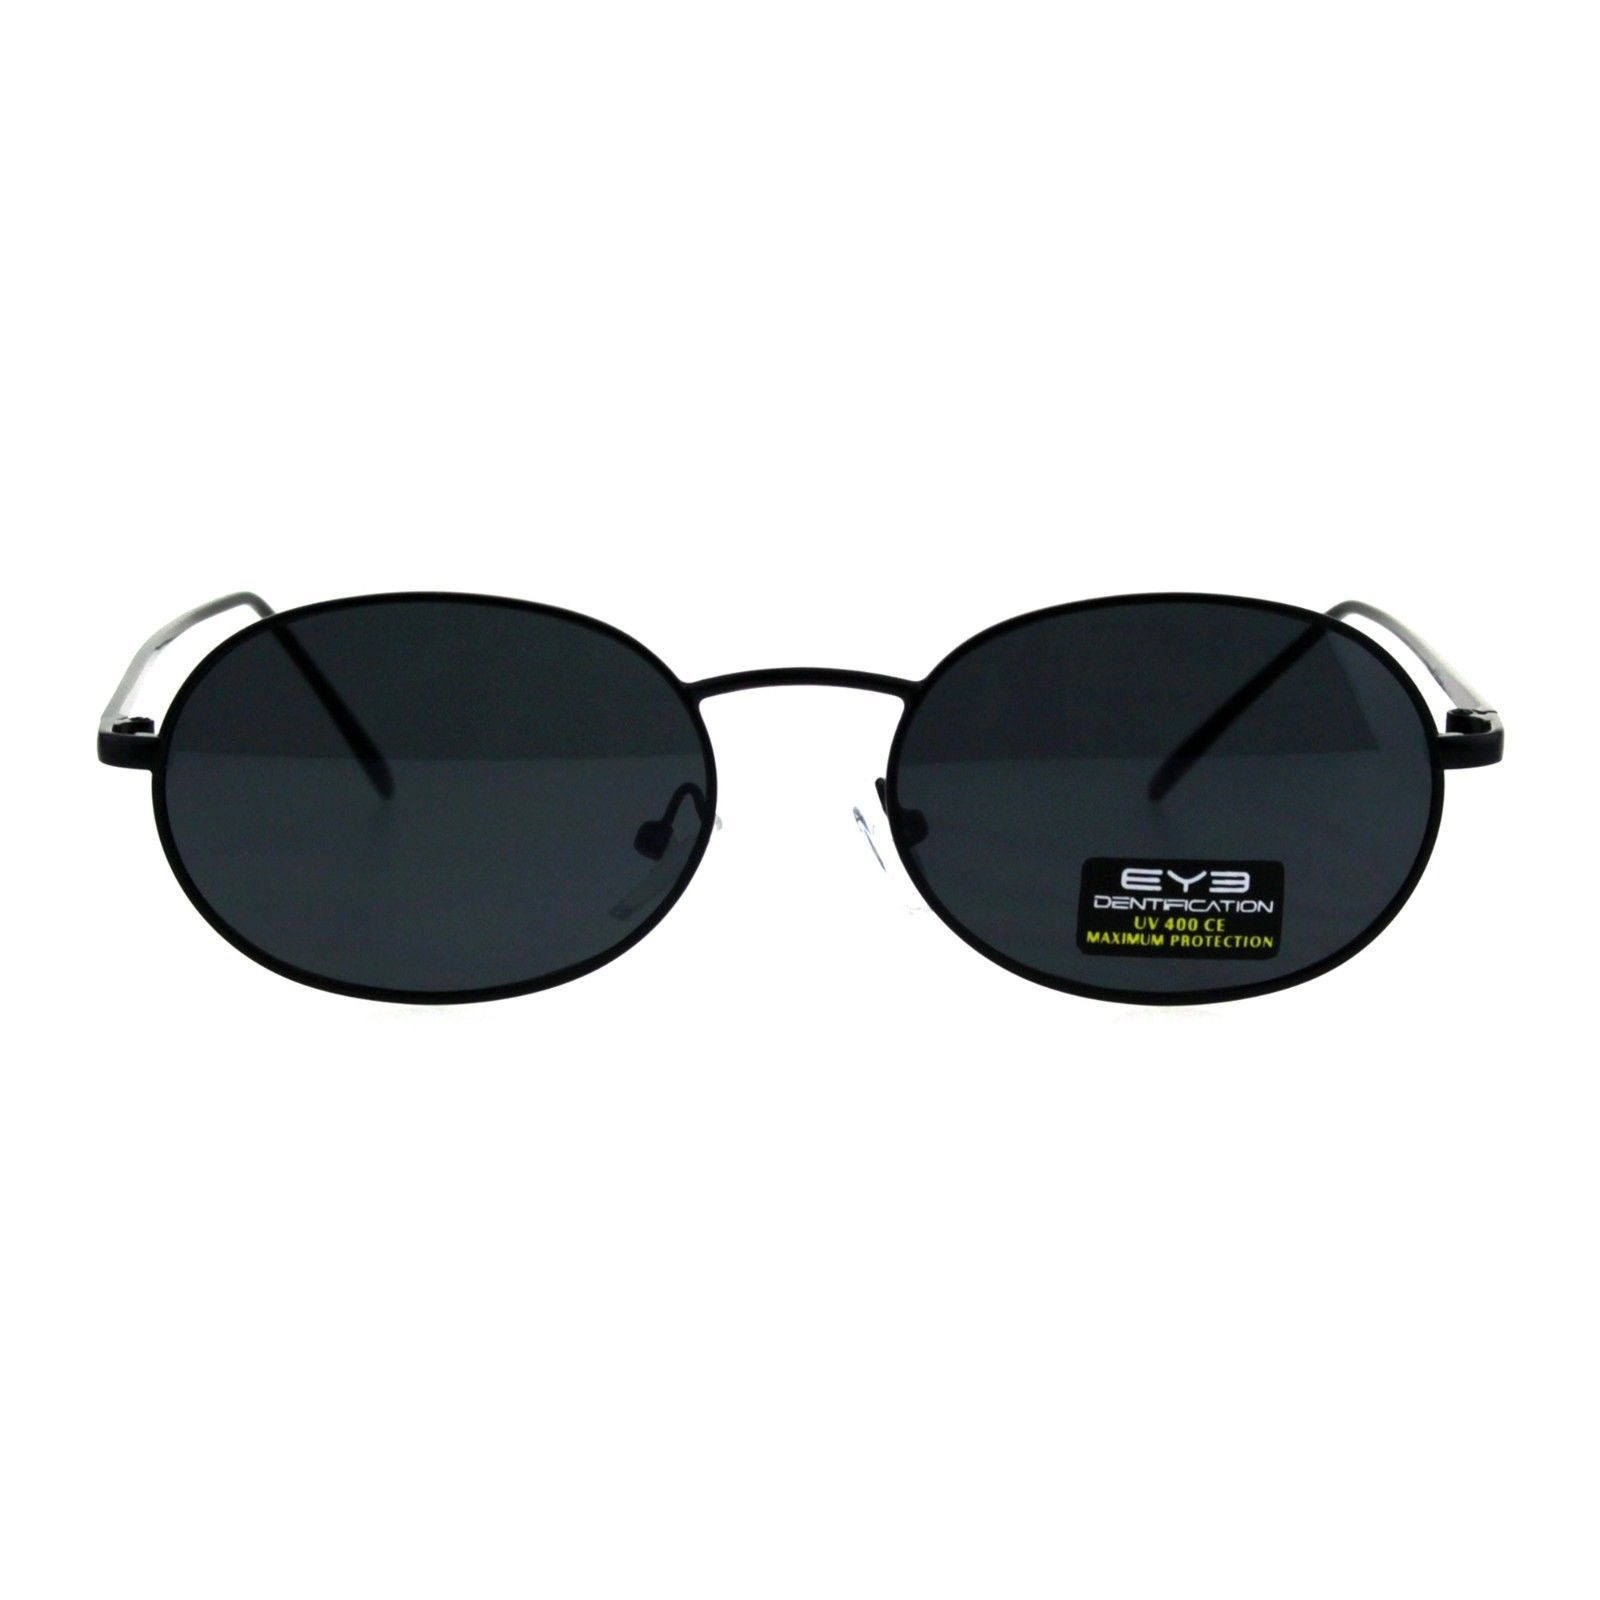 Unisex Oval Sunglasses Metal Frame Vintage Retro Fashion UV 400